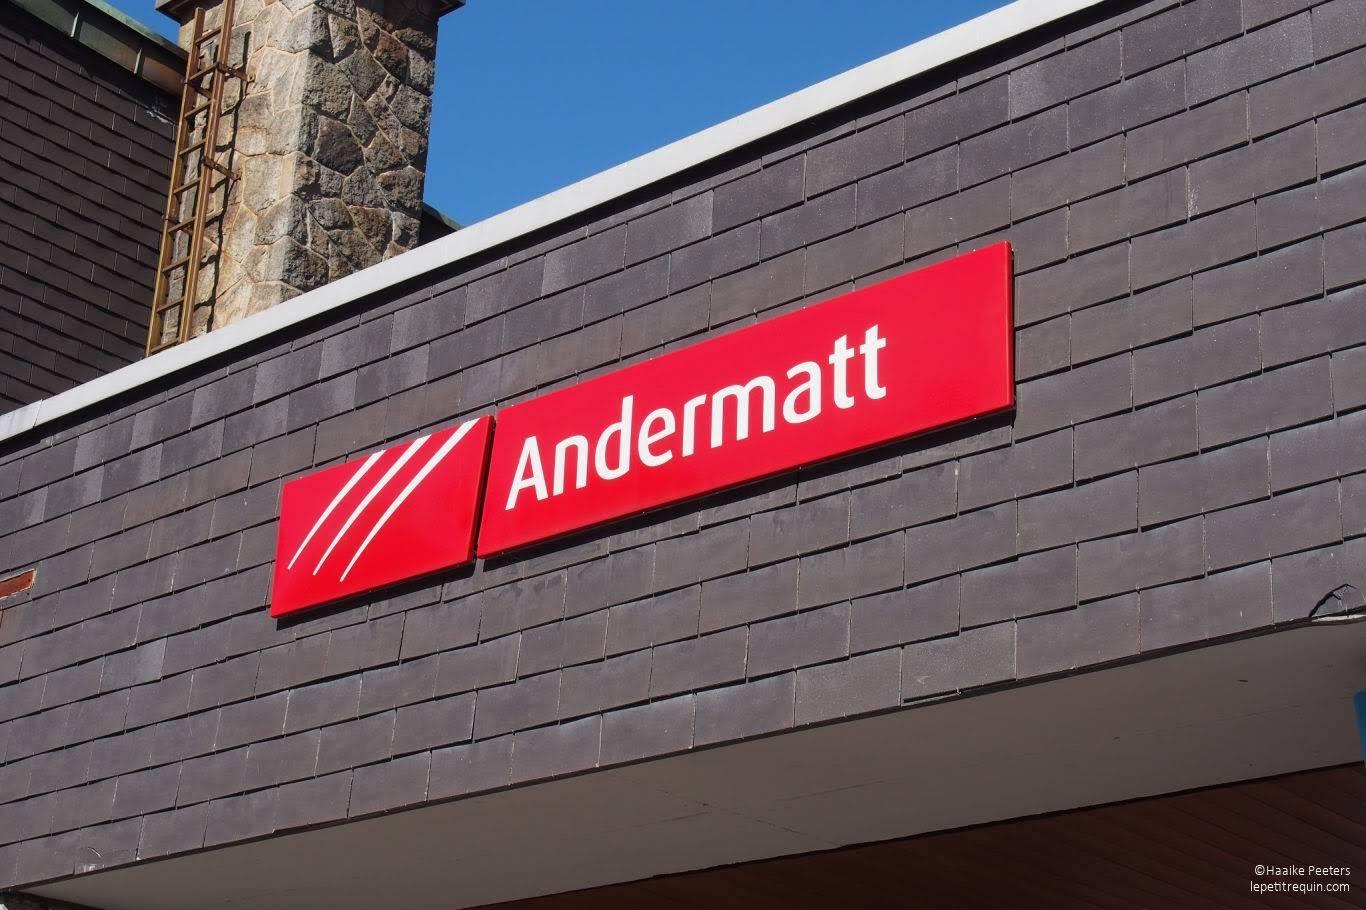 Bahnhof Andermatt (Le petit requin)